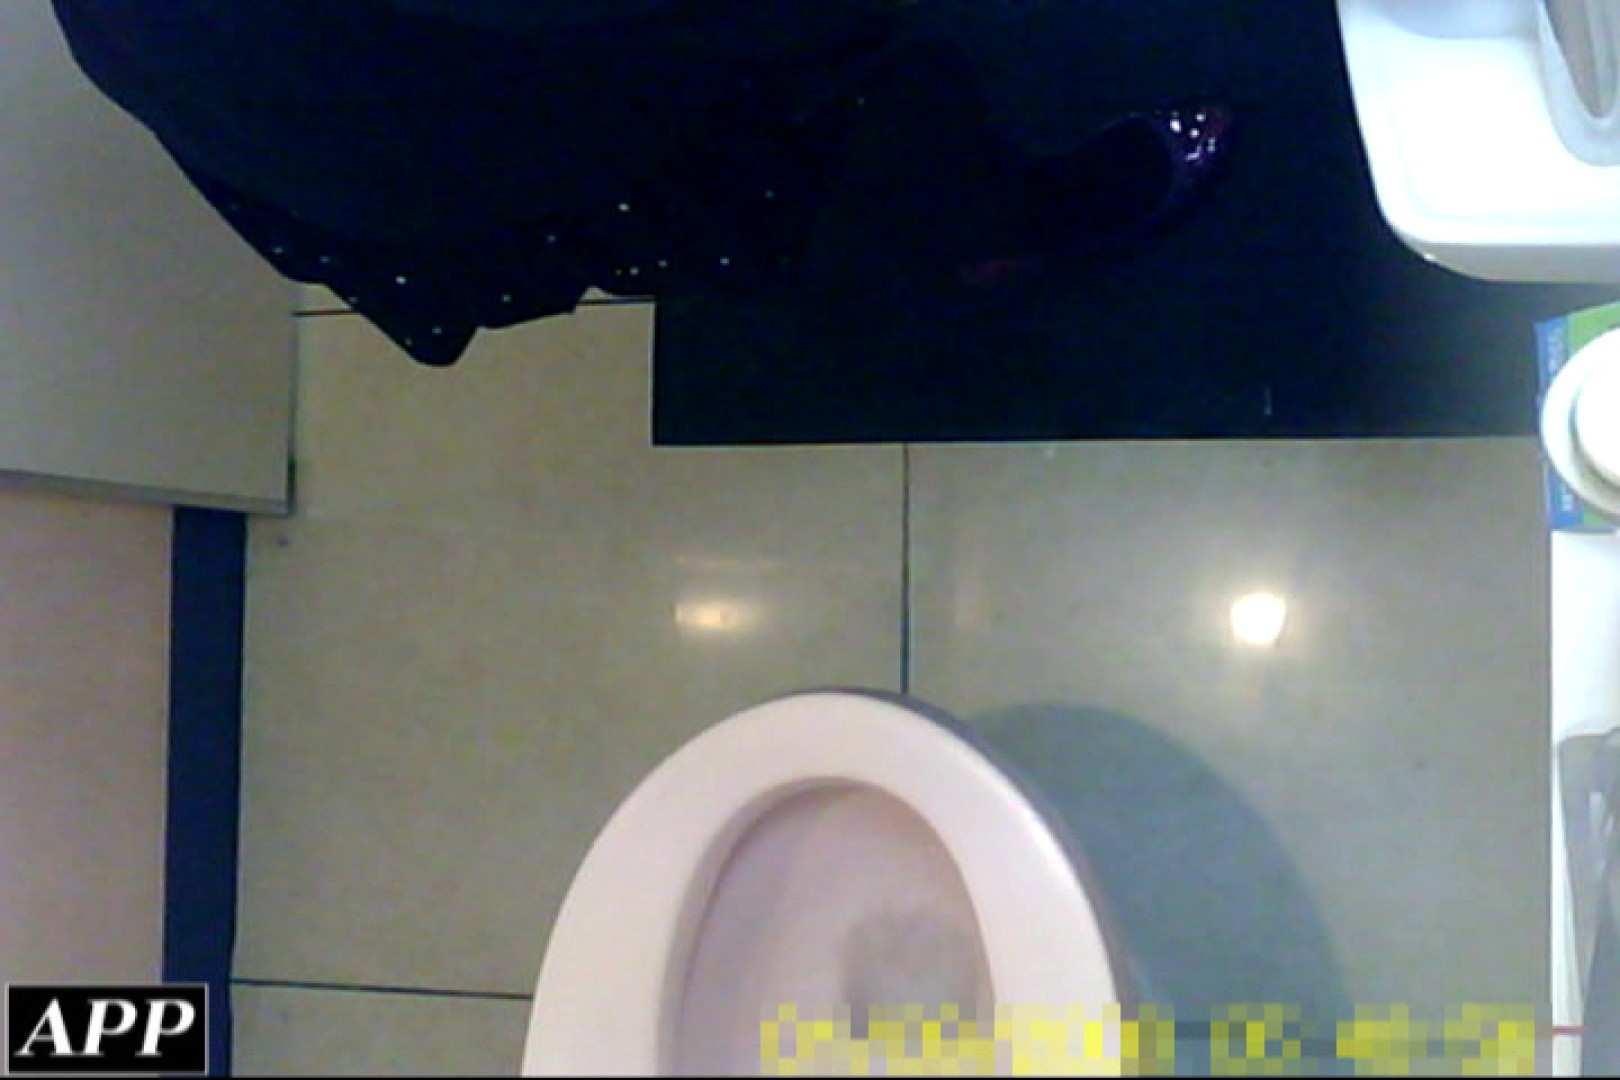 3視点洗面所 vol.089 洗面所 | OLセックス  79画像 67